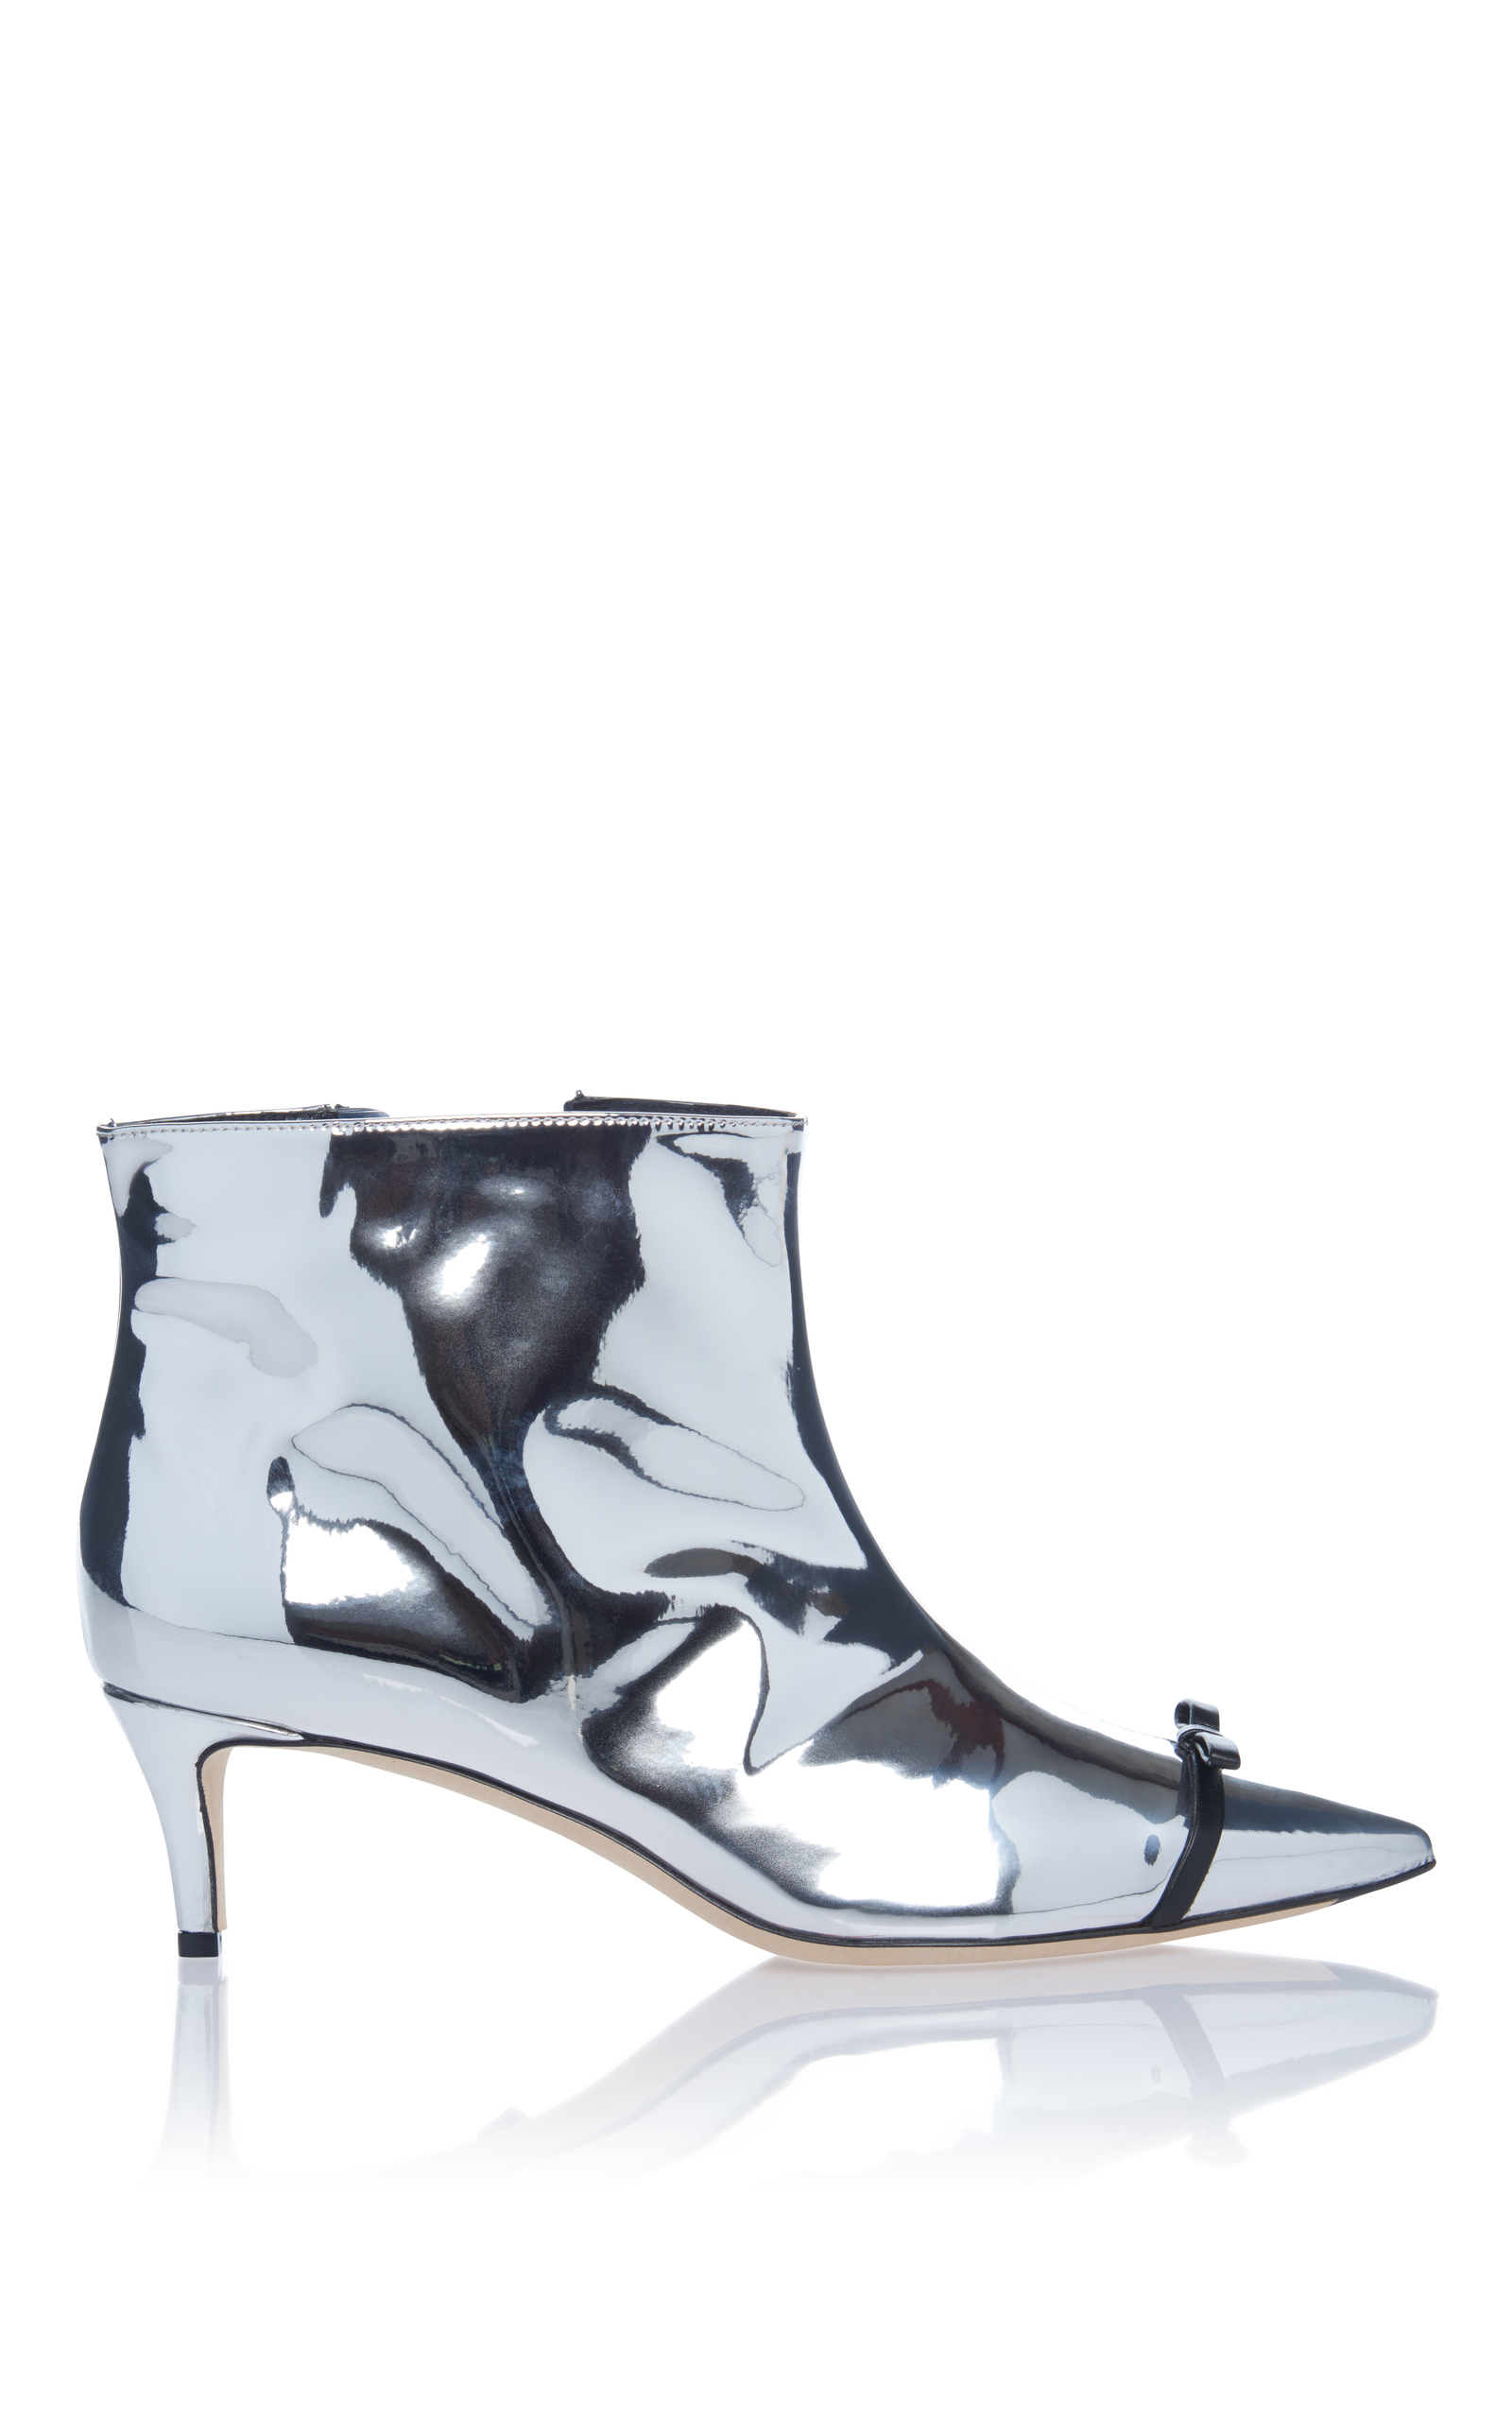 c245a205b8 Metallic Kitten Heel Bootie by Marco de Vincenzo | Moda Operandi